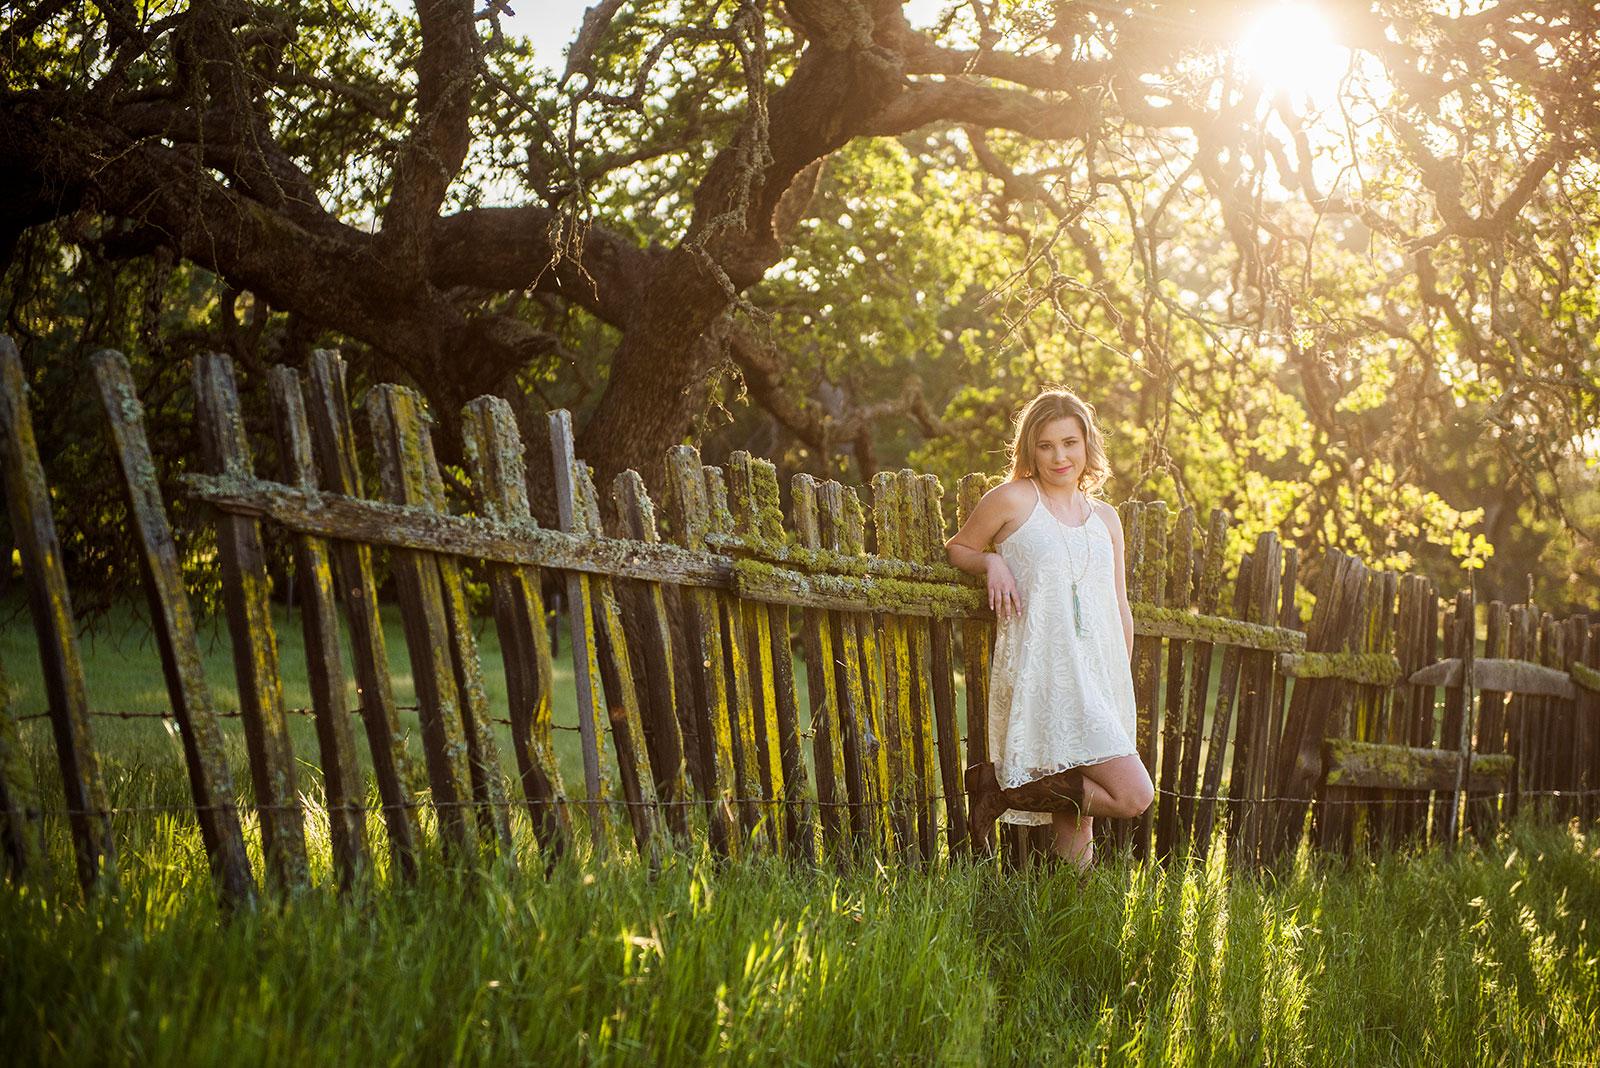 triolo-senior-hollister-photographer-01